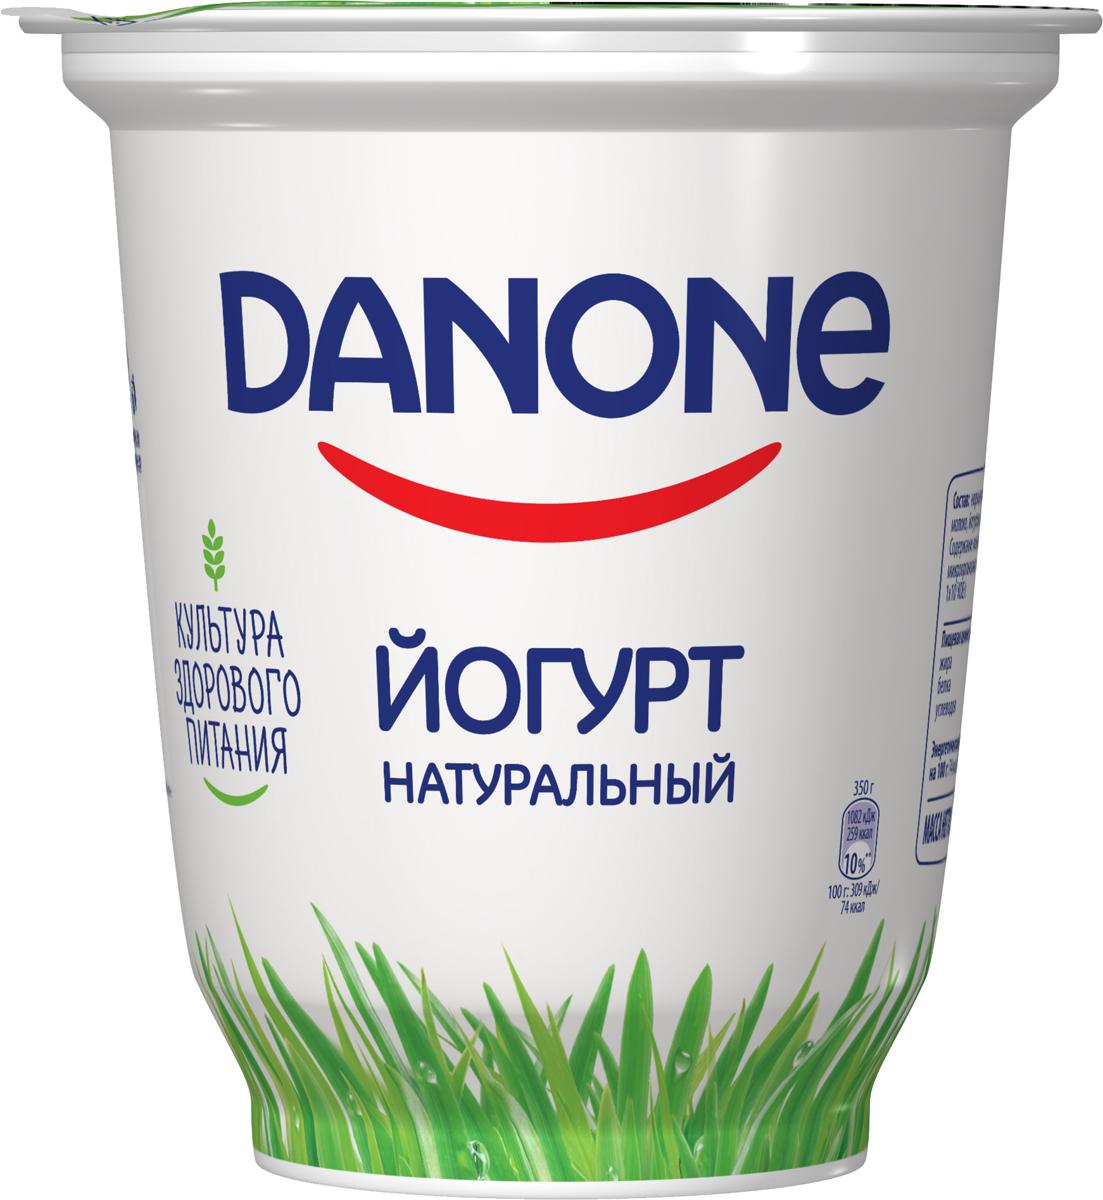 Danone Йогурт густой Натуральный 3,3%, 350 г